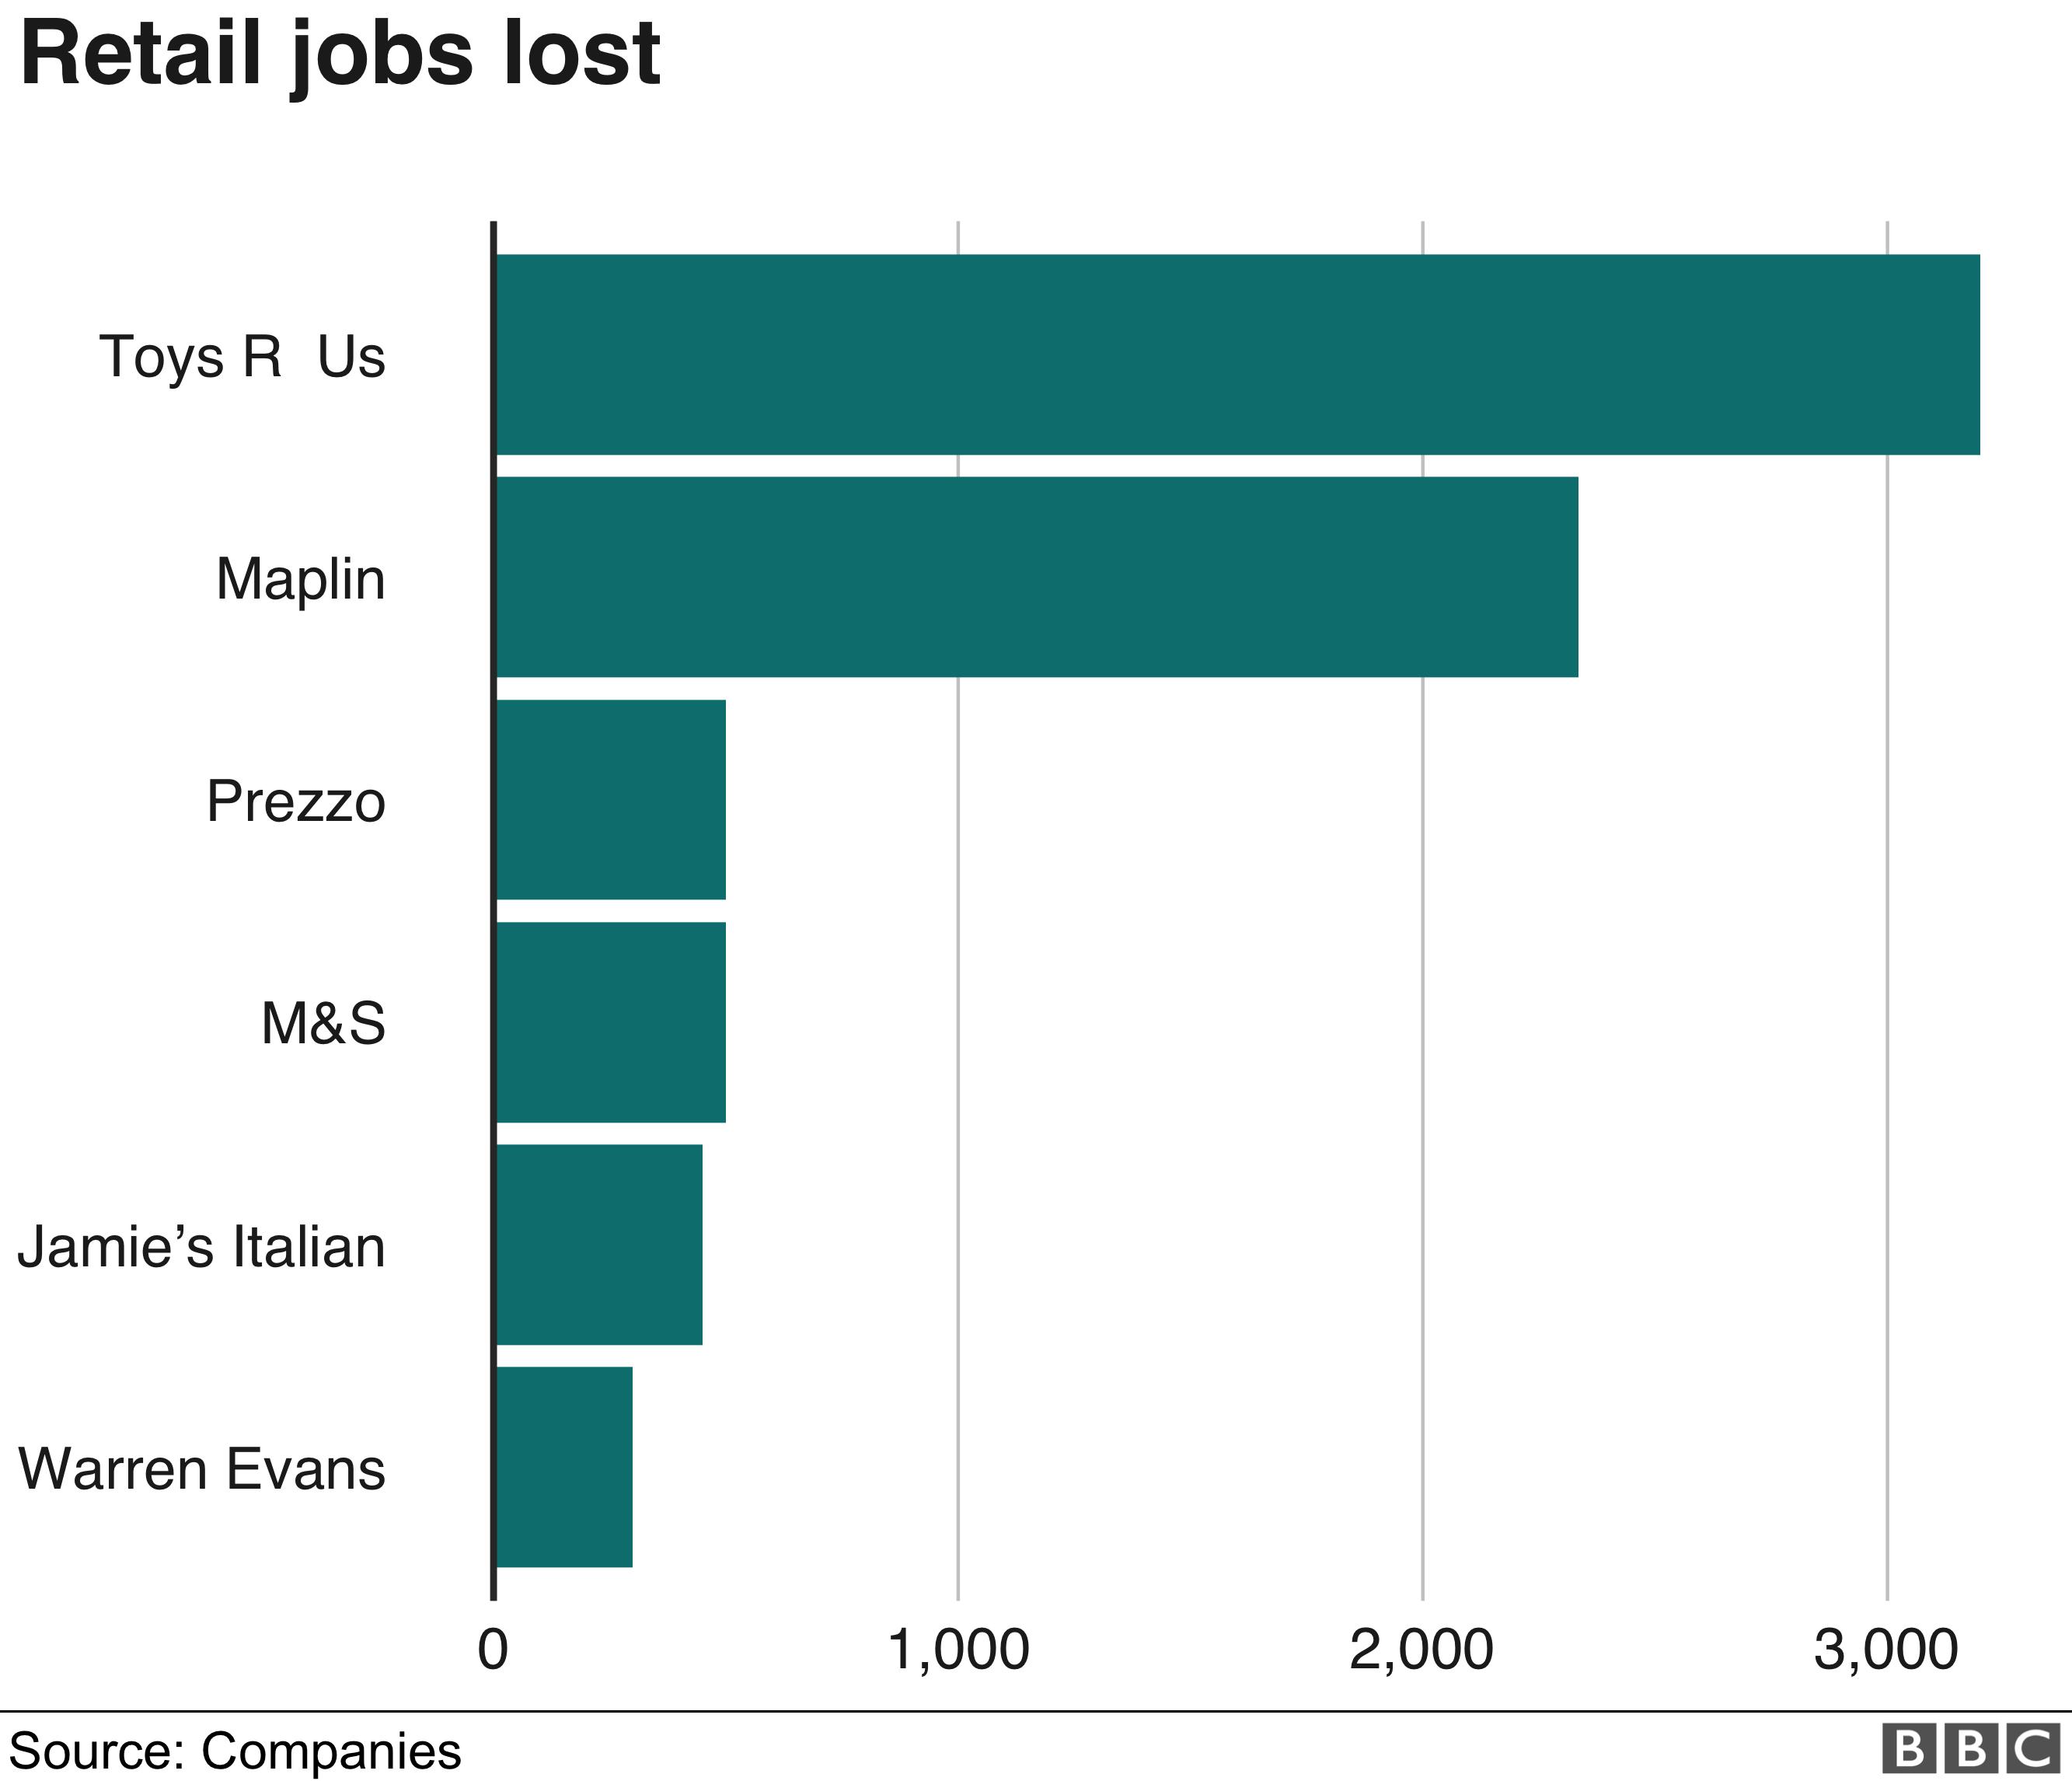 Retail jobs lost